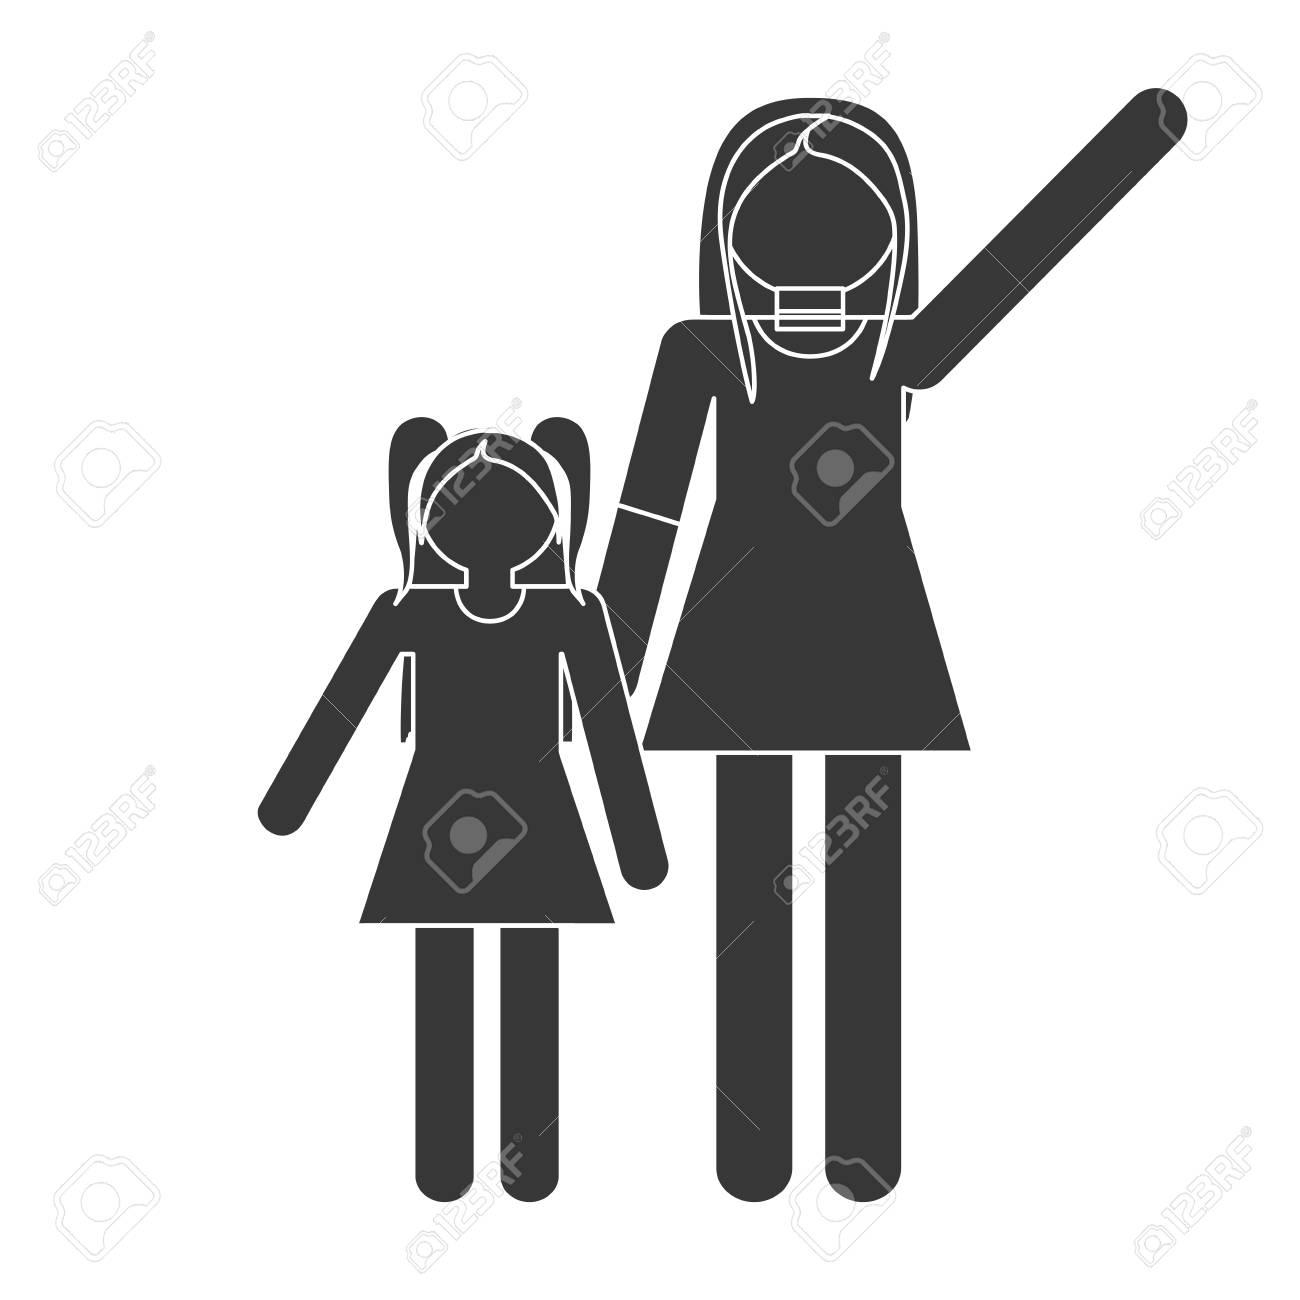 Silueta Madre E Hija Relación Familia Vector Ilustración Eps 10